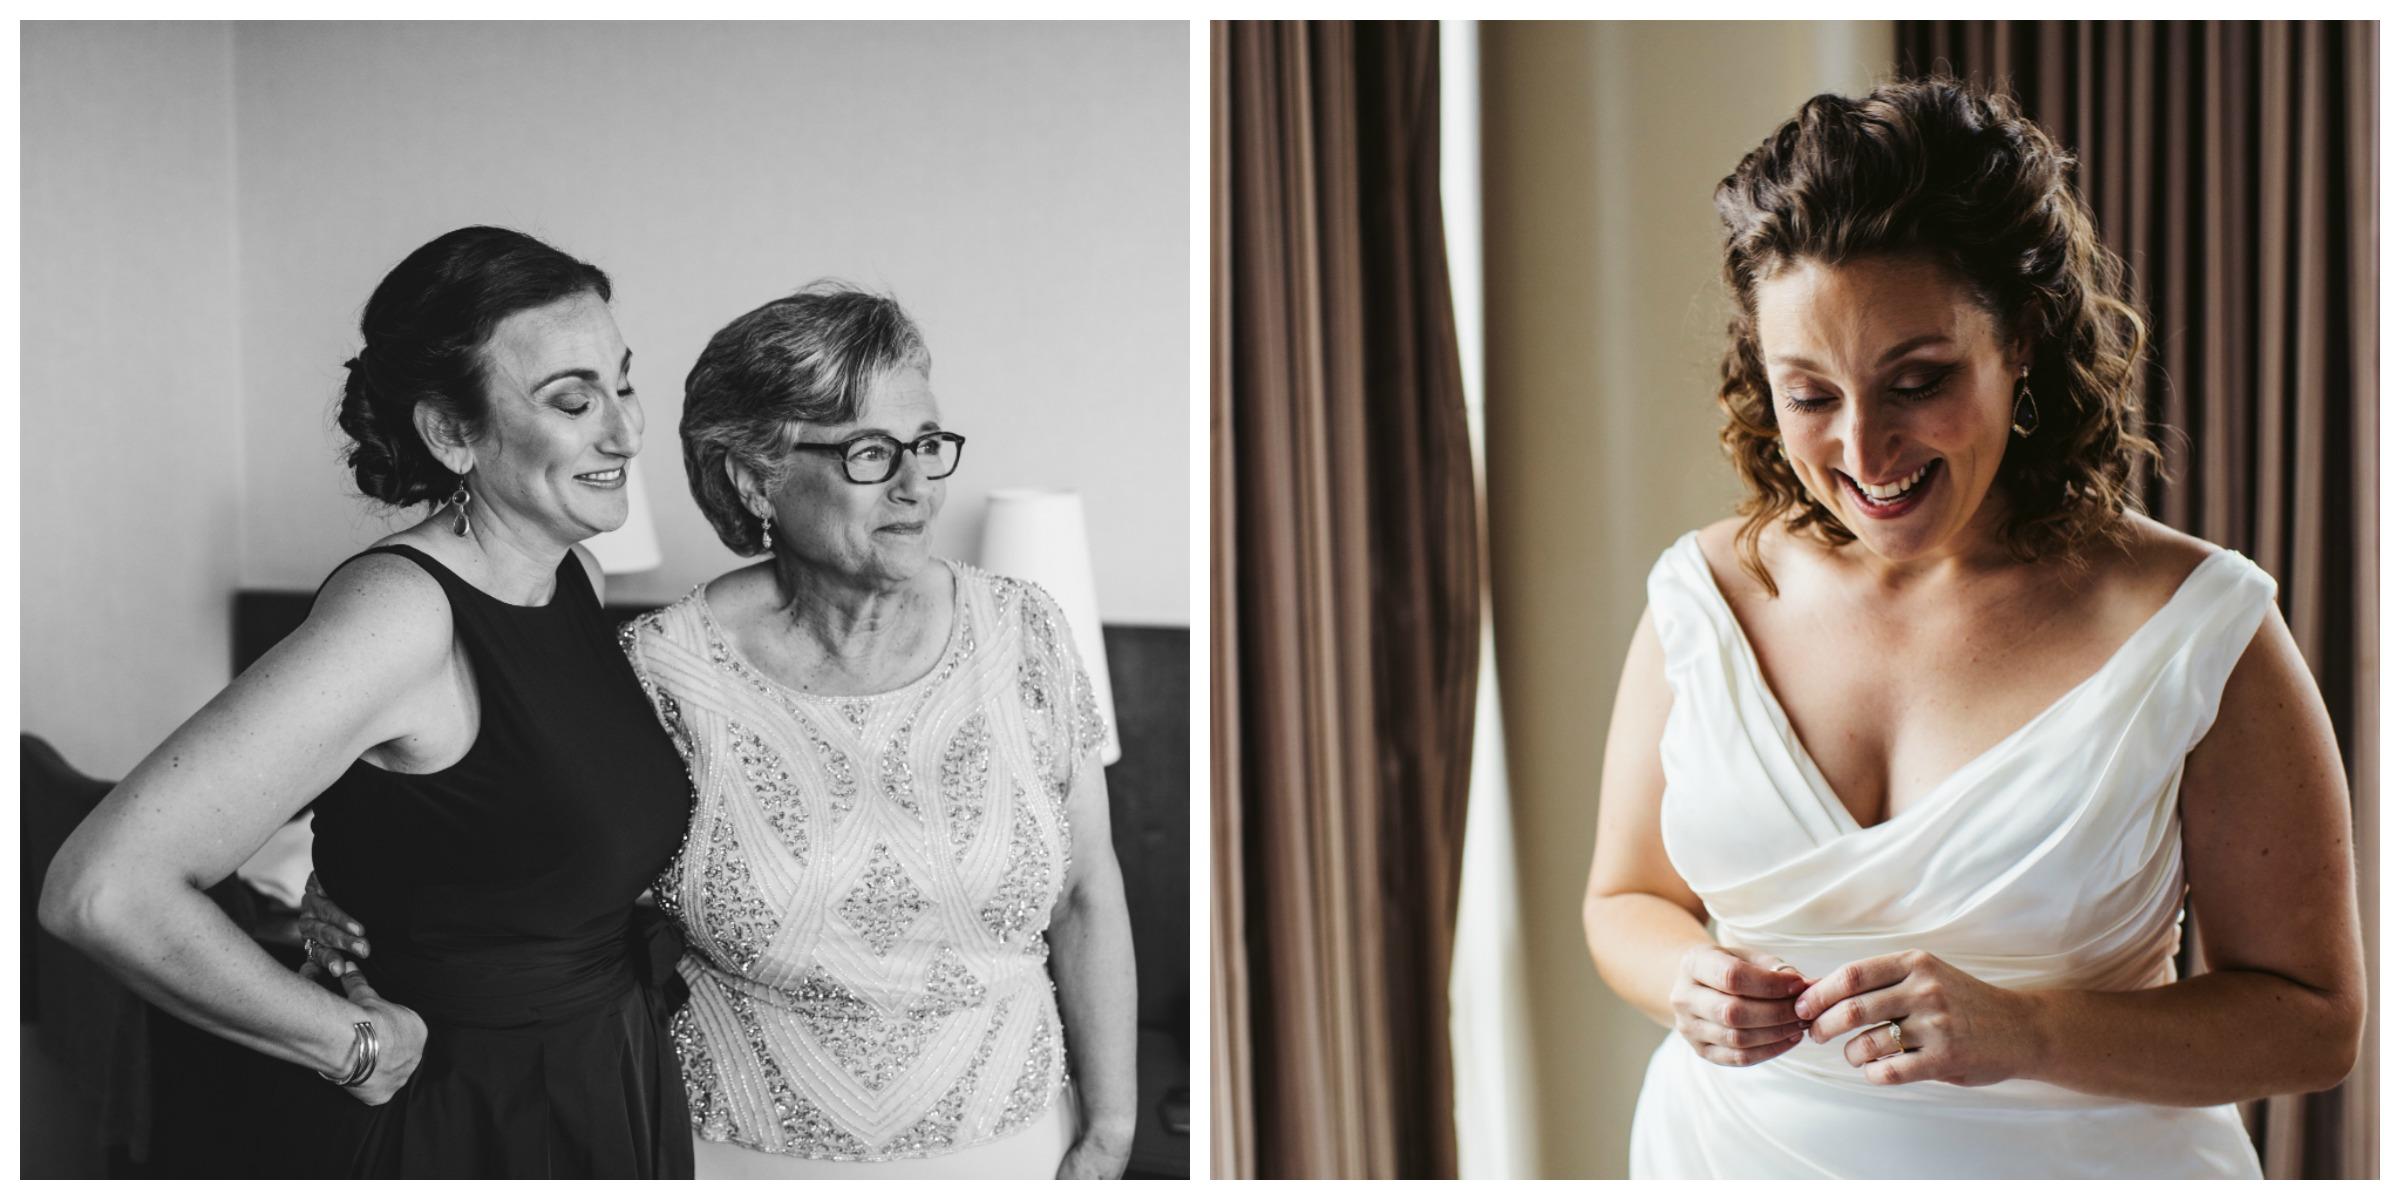 BATTERY PARK GARDENS WEDDING - NYC INTIMATE WEDDING PHOTOGRAPHER - CHI-CHI ARI 3.jpg